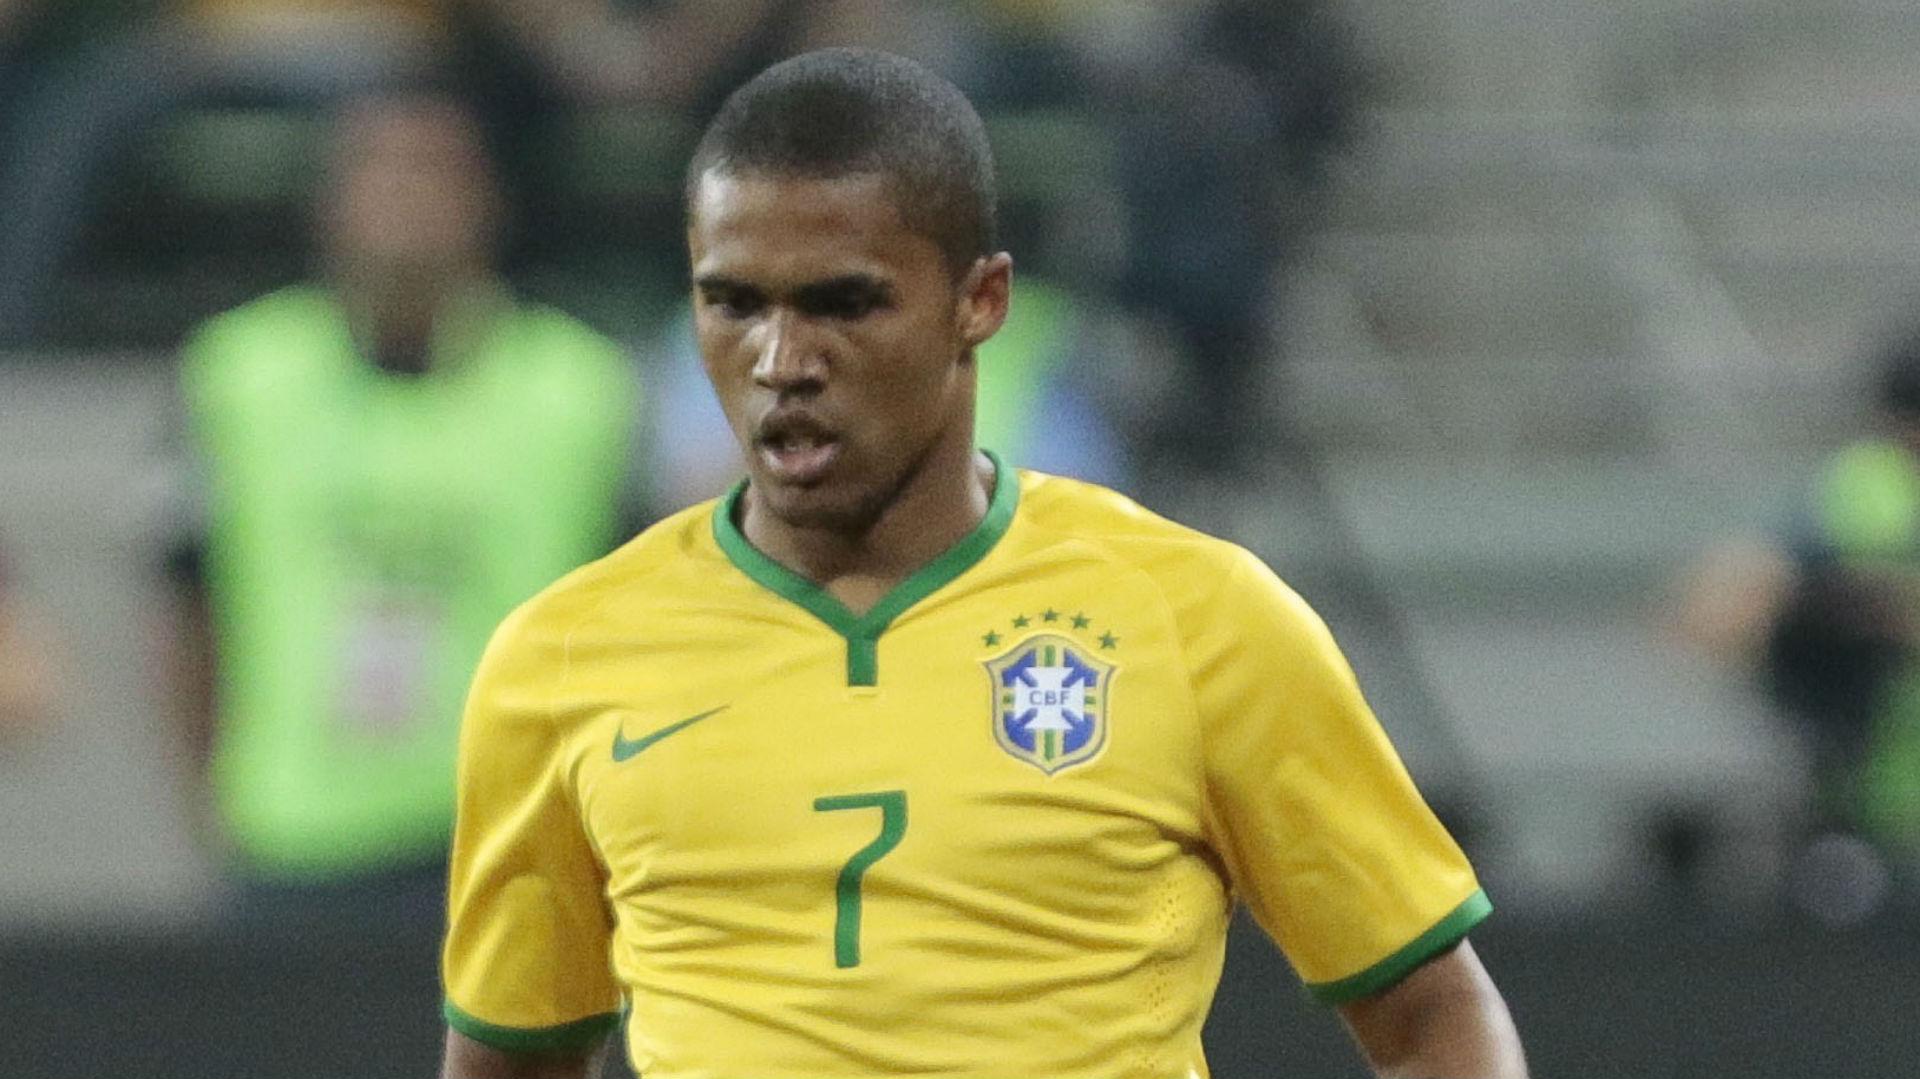 Douglas Costa Brazil